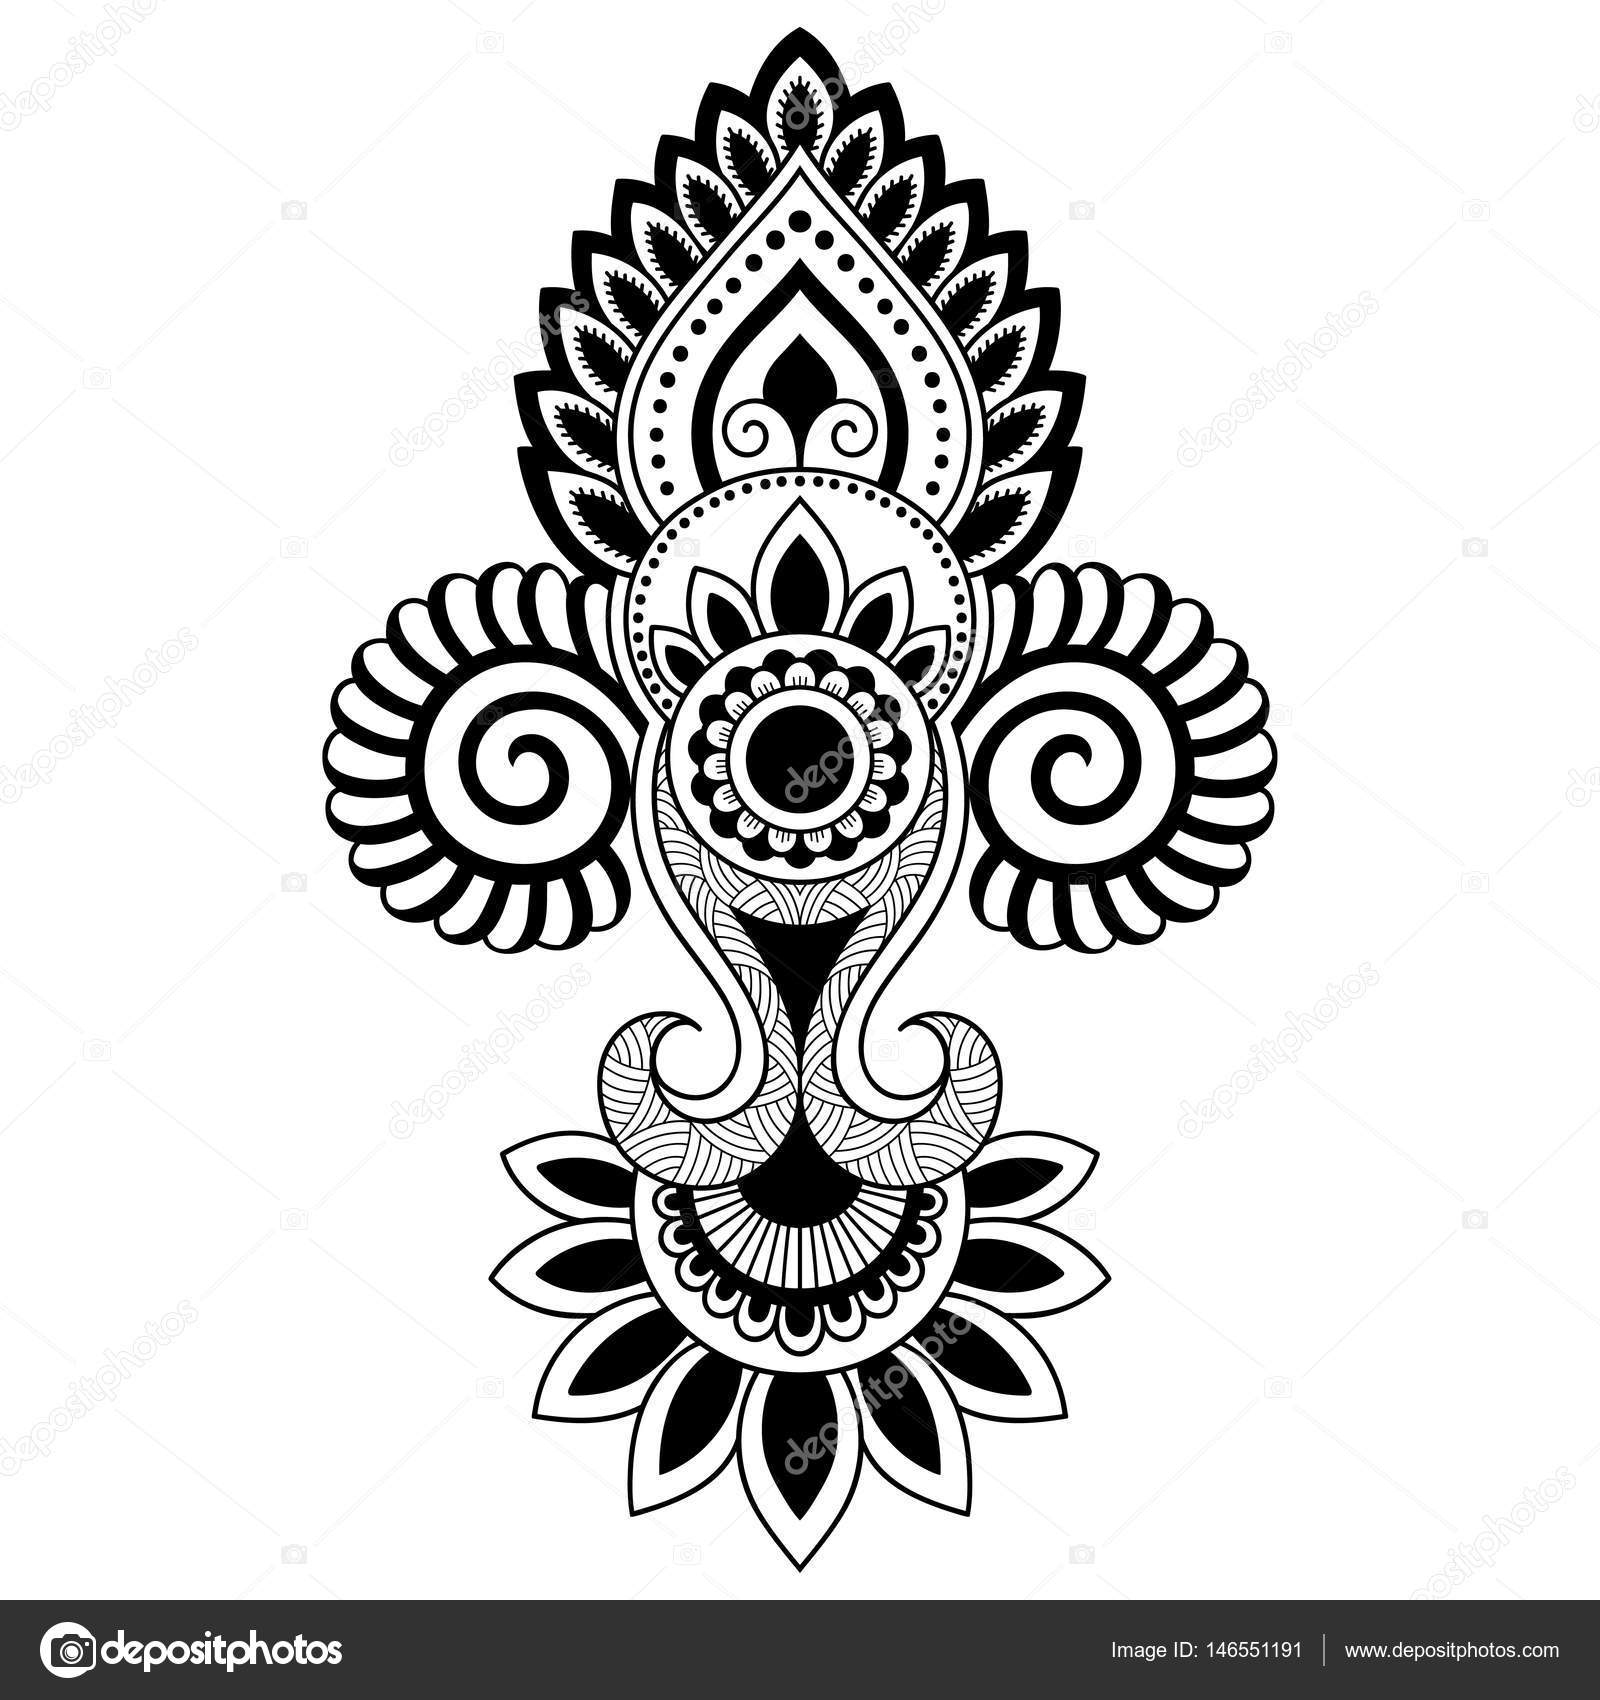 tatouage motif indien galerie tatouage. Black Bedroom Furniture Sets. Home Design Ideas